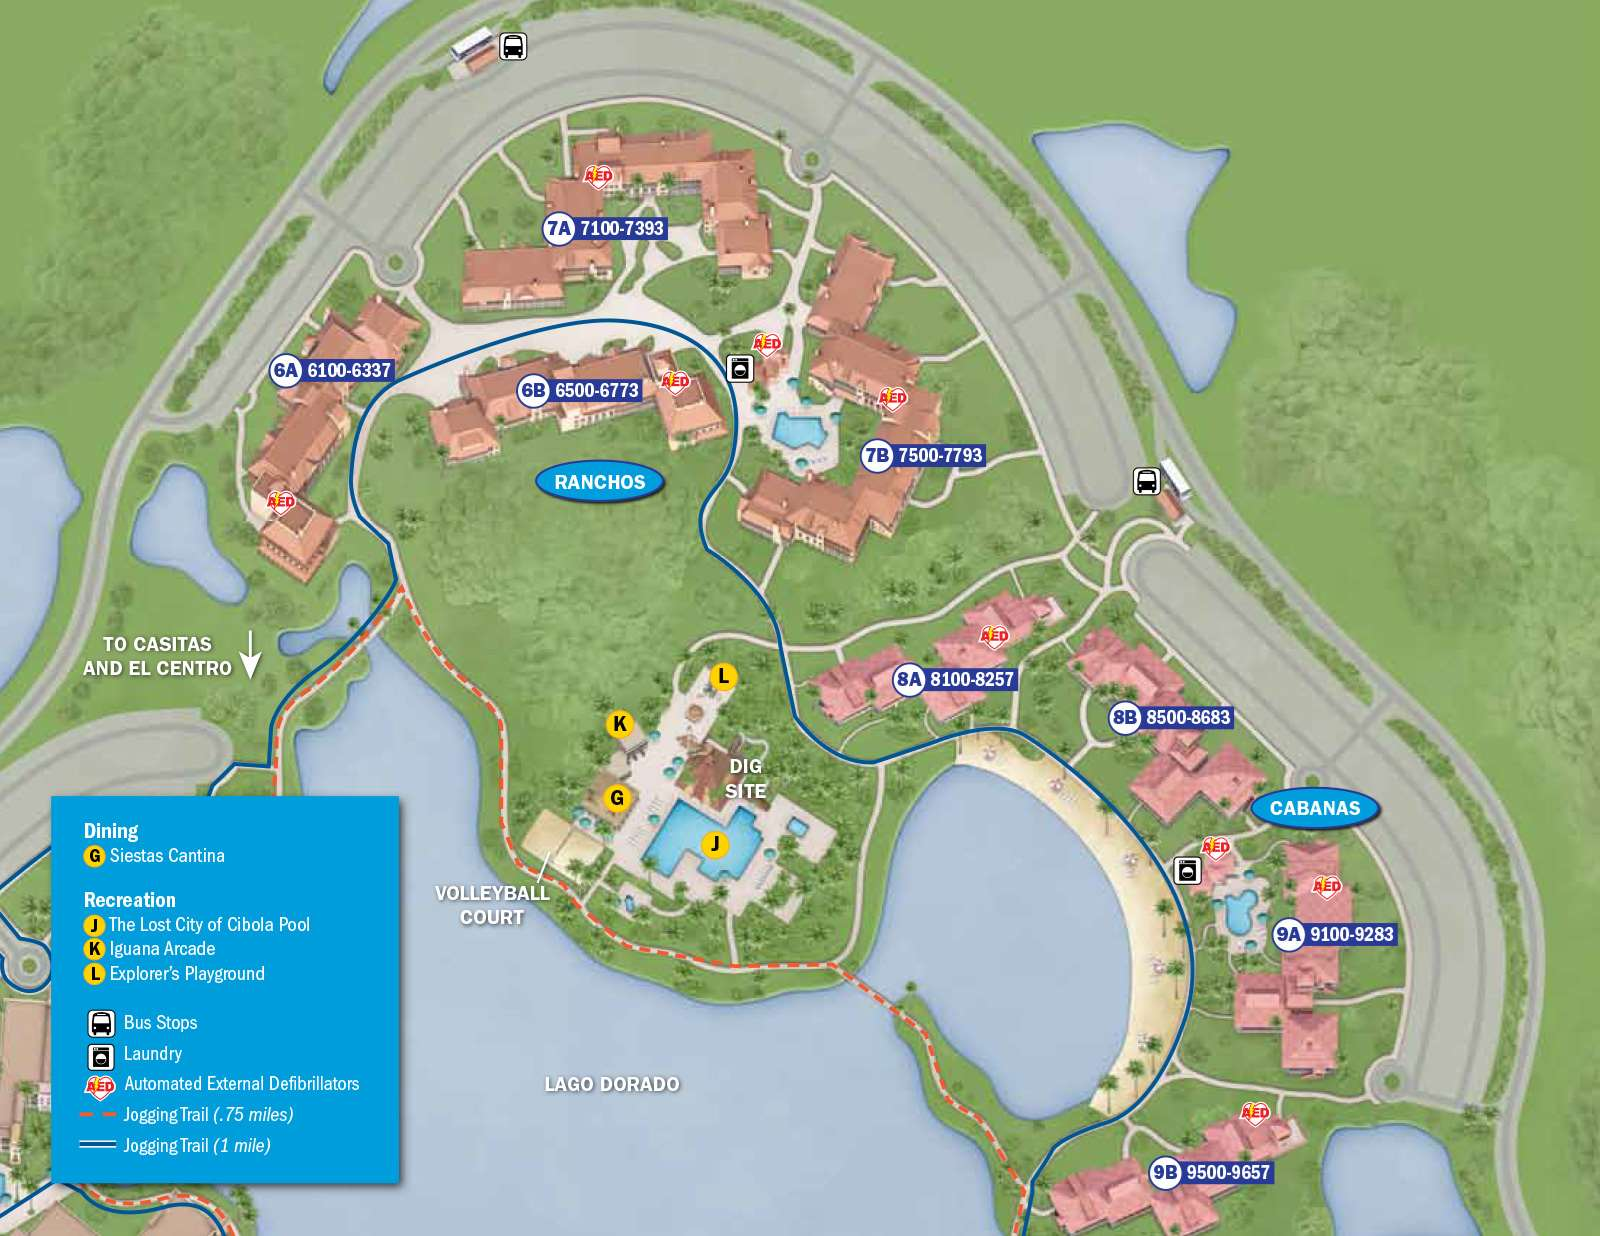 PHOTOS - New design of maps now at Walt Disney World resort hotels